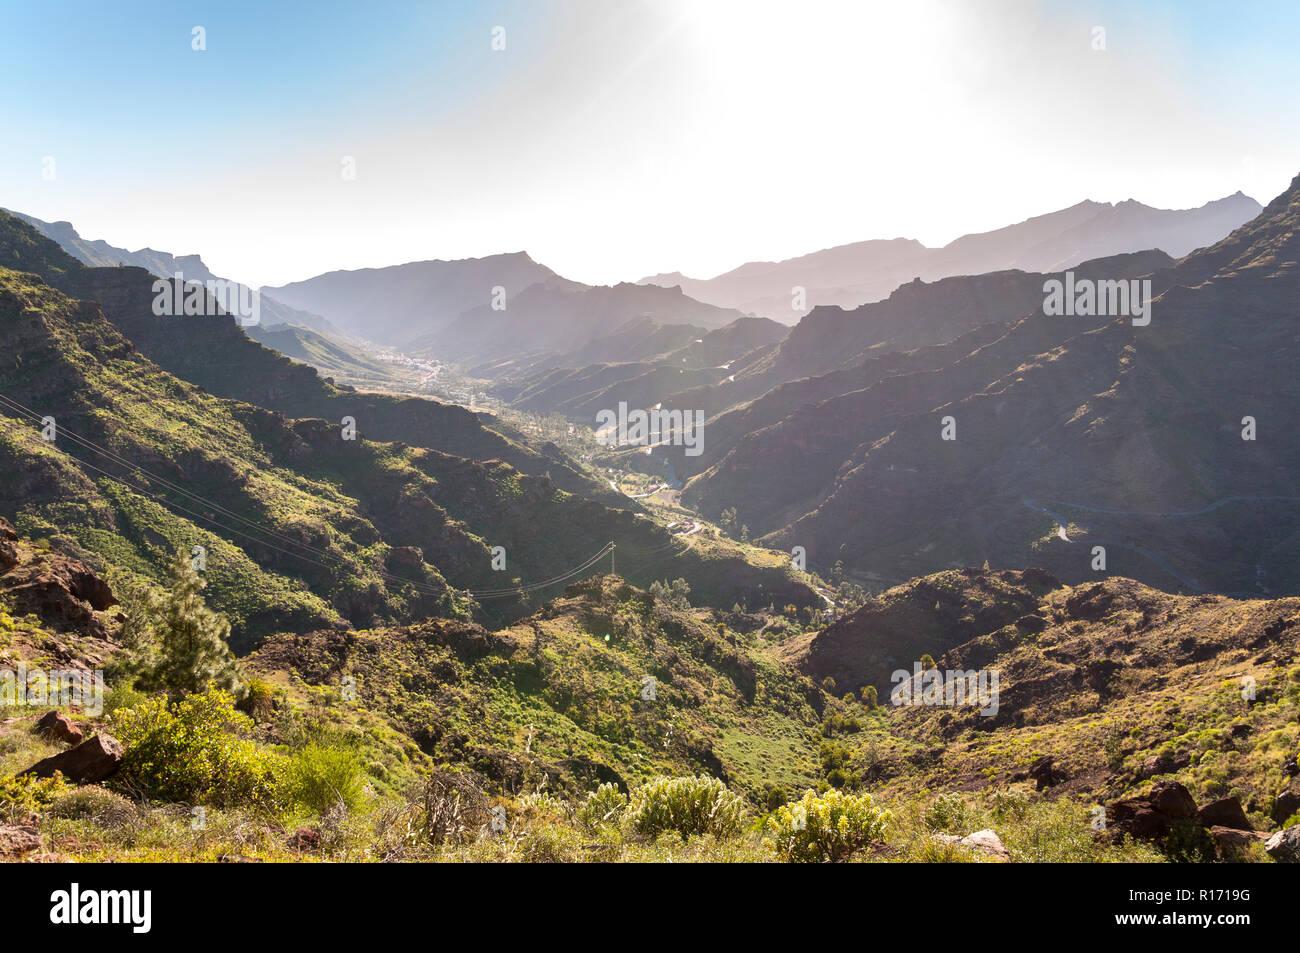 Mountainous landscape in the interior of the Gran Canaria Island, Canary Islands, Spain. Photo taken from the Mirador El Mulato, Lookout Mulatto. Stock Photo